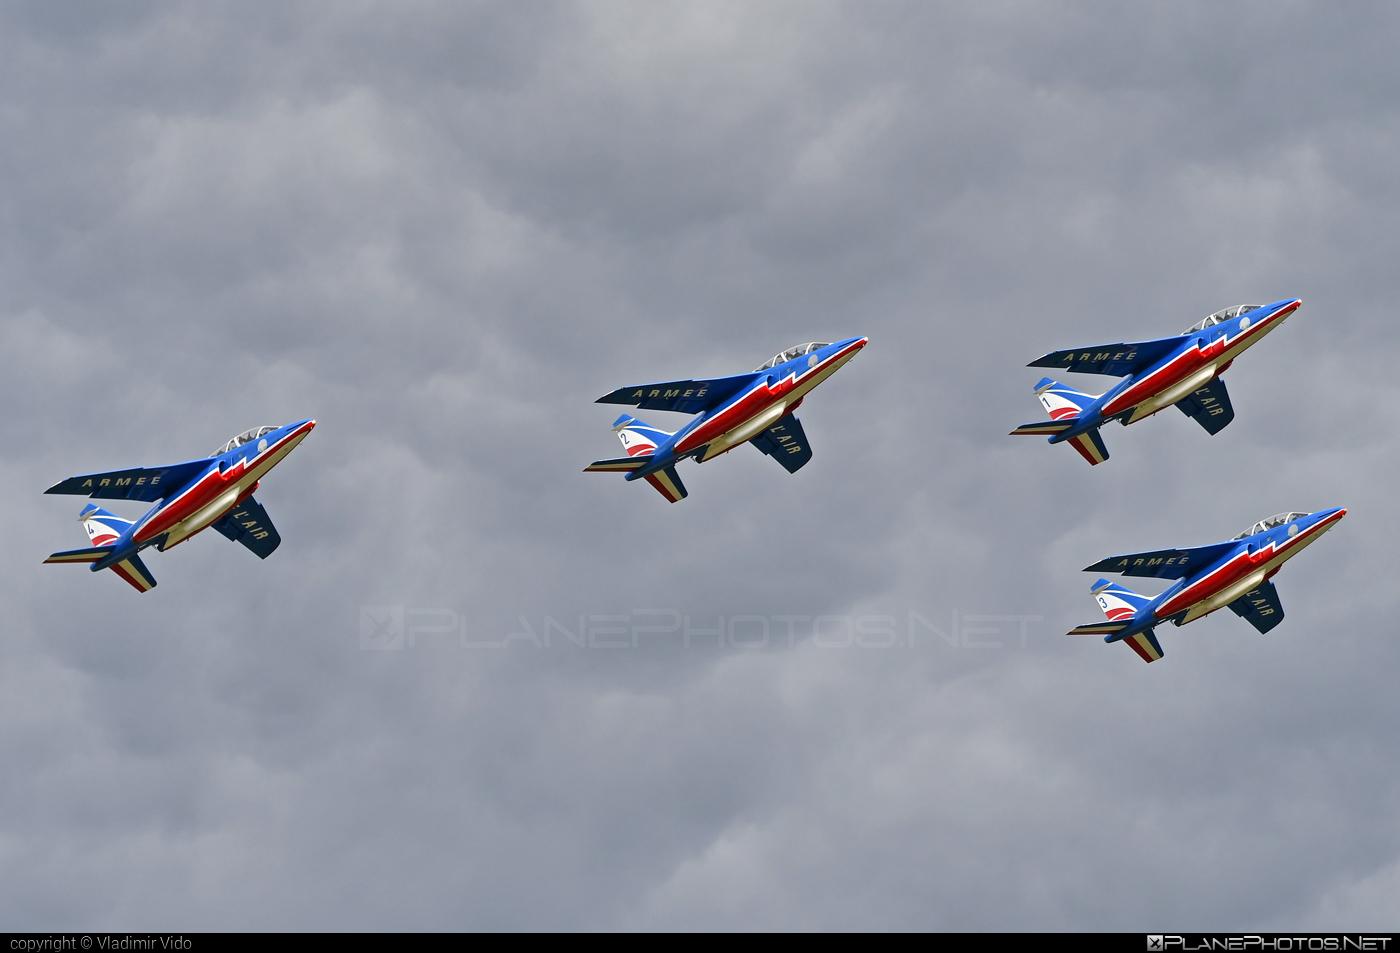 Dassault-Dornier Alpha Jet E - E113 operated by Armée de l´Air (French Air Force) #alphajet #alphajete #armeedelair #dassaultdornier #frenchairforce